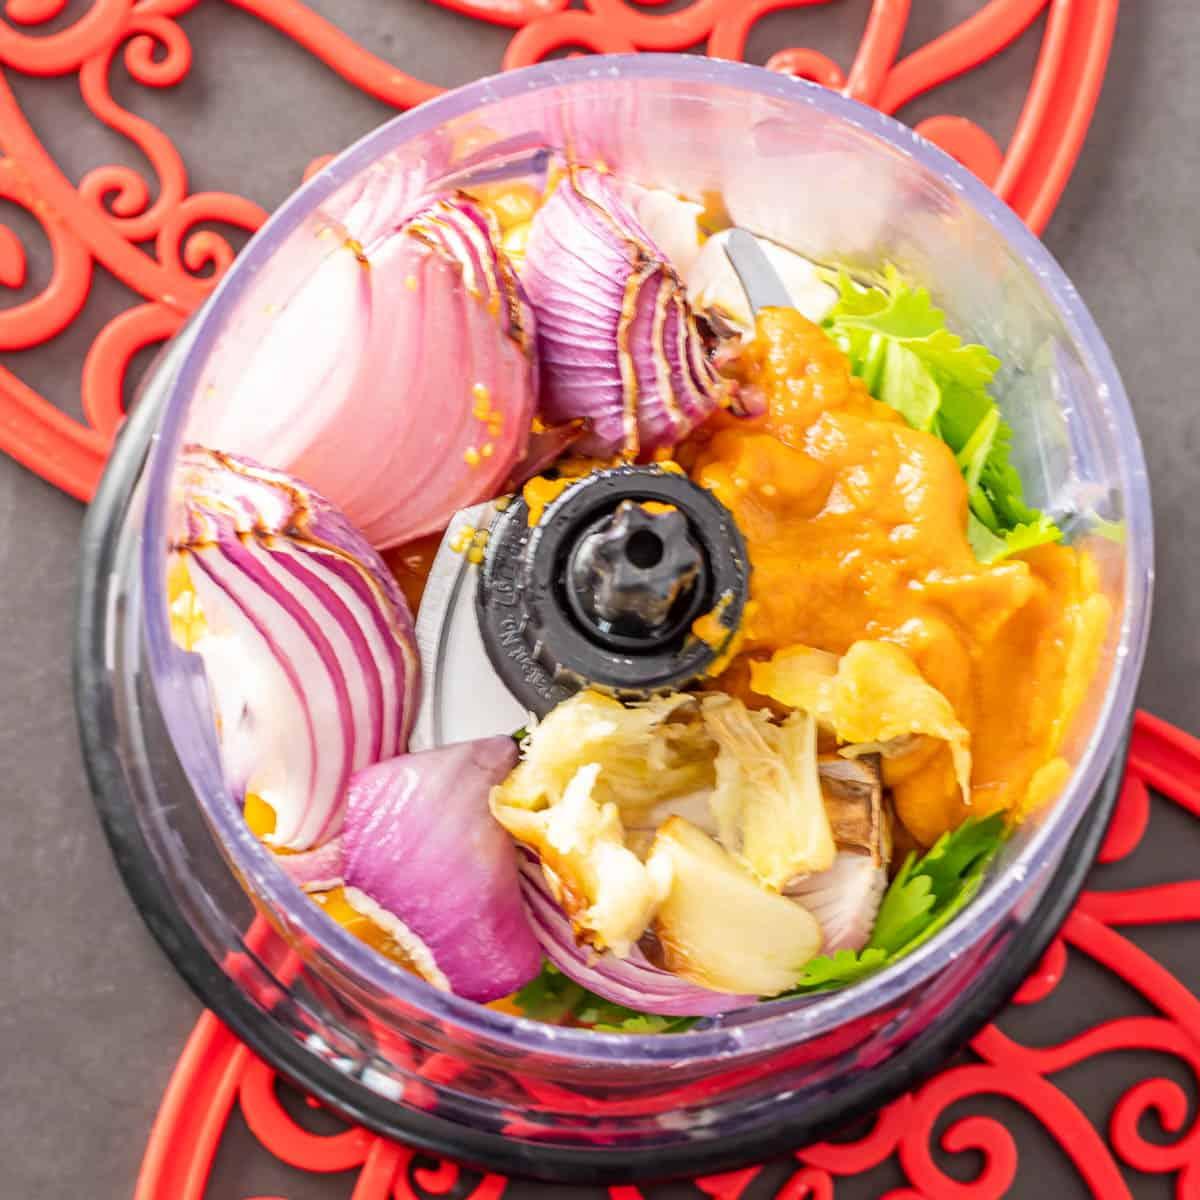 A small food processor with onion, aji amarillo paste, garlic, cilantro, and goldenberries.